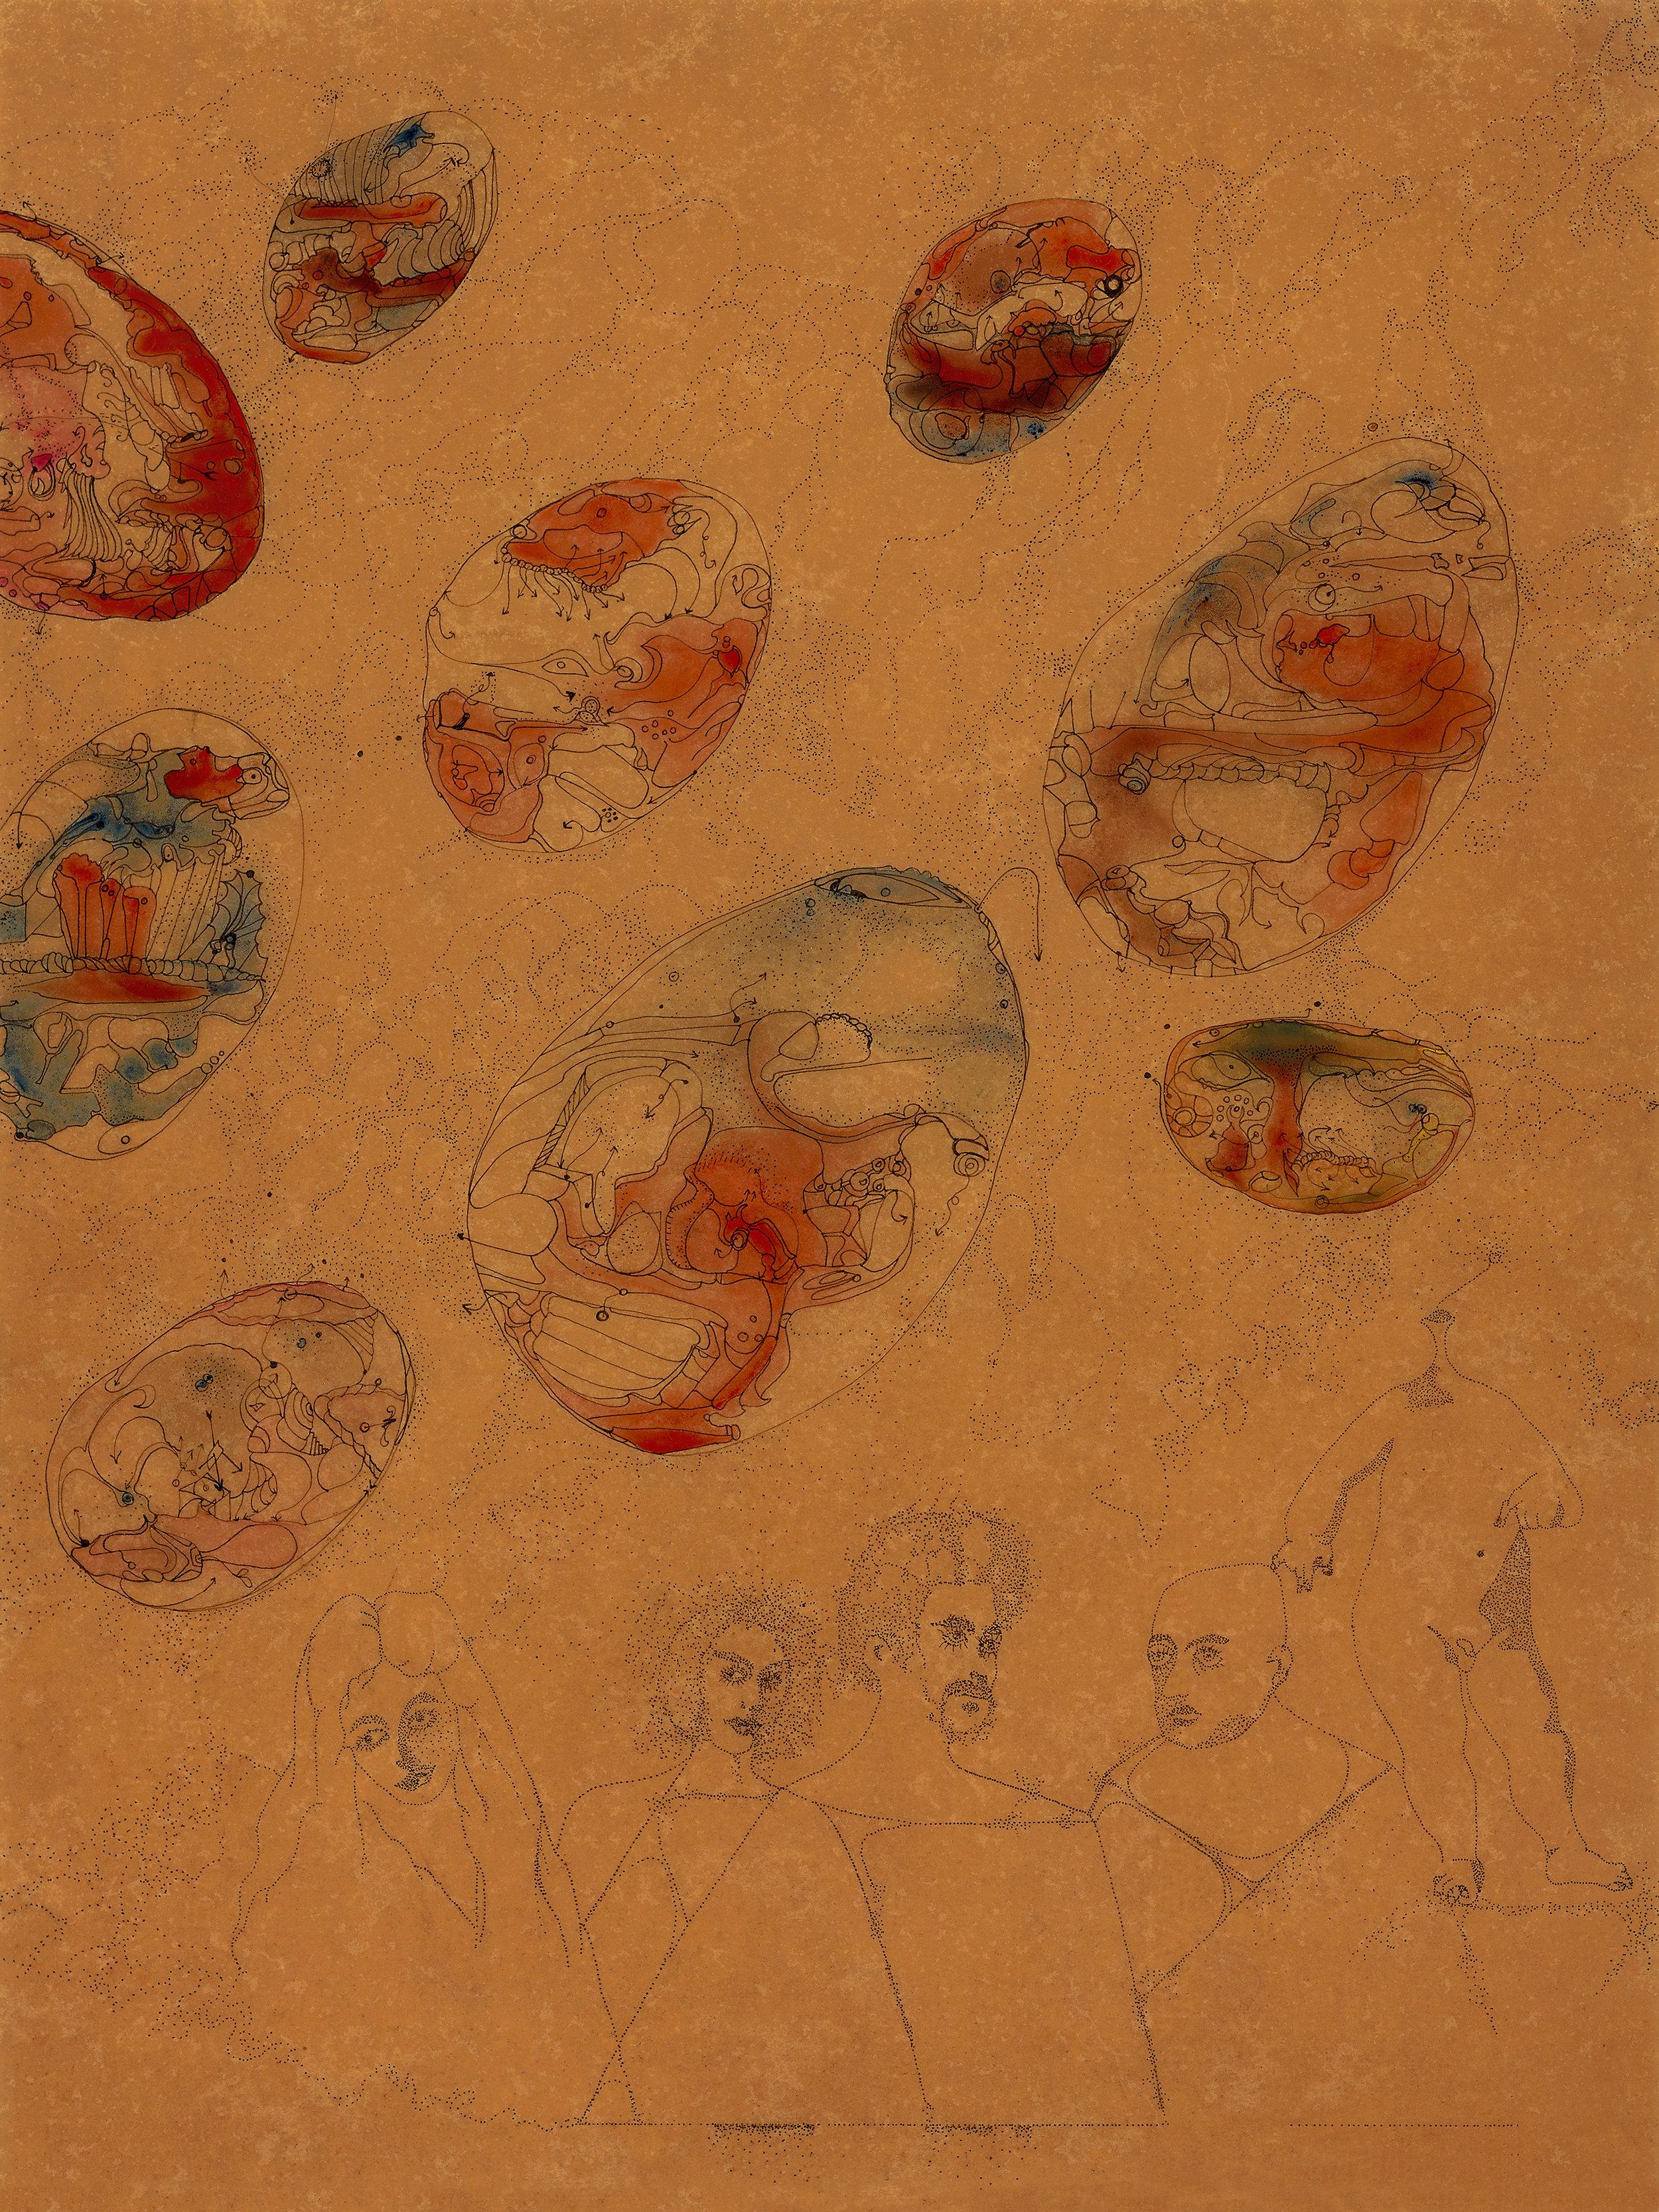 RogelioMaxwell-Allegory of a Good Day - 1971 - ArchivalPigmentPrint - 30x40 - $1500.jpeg